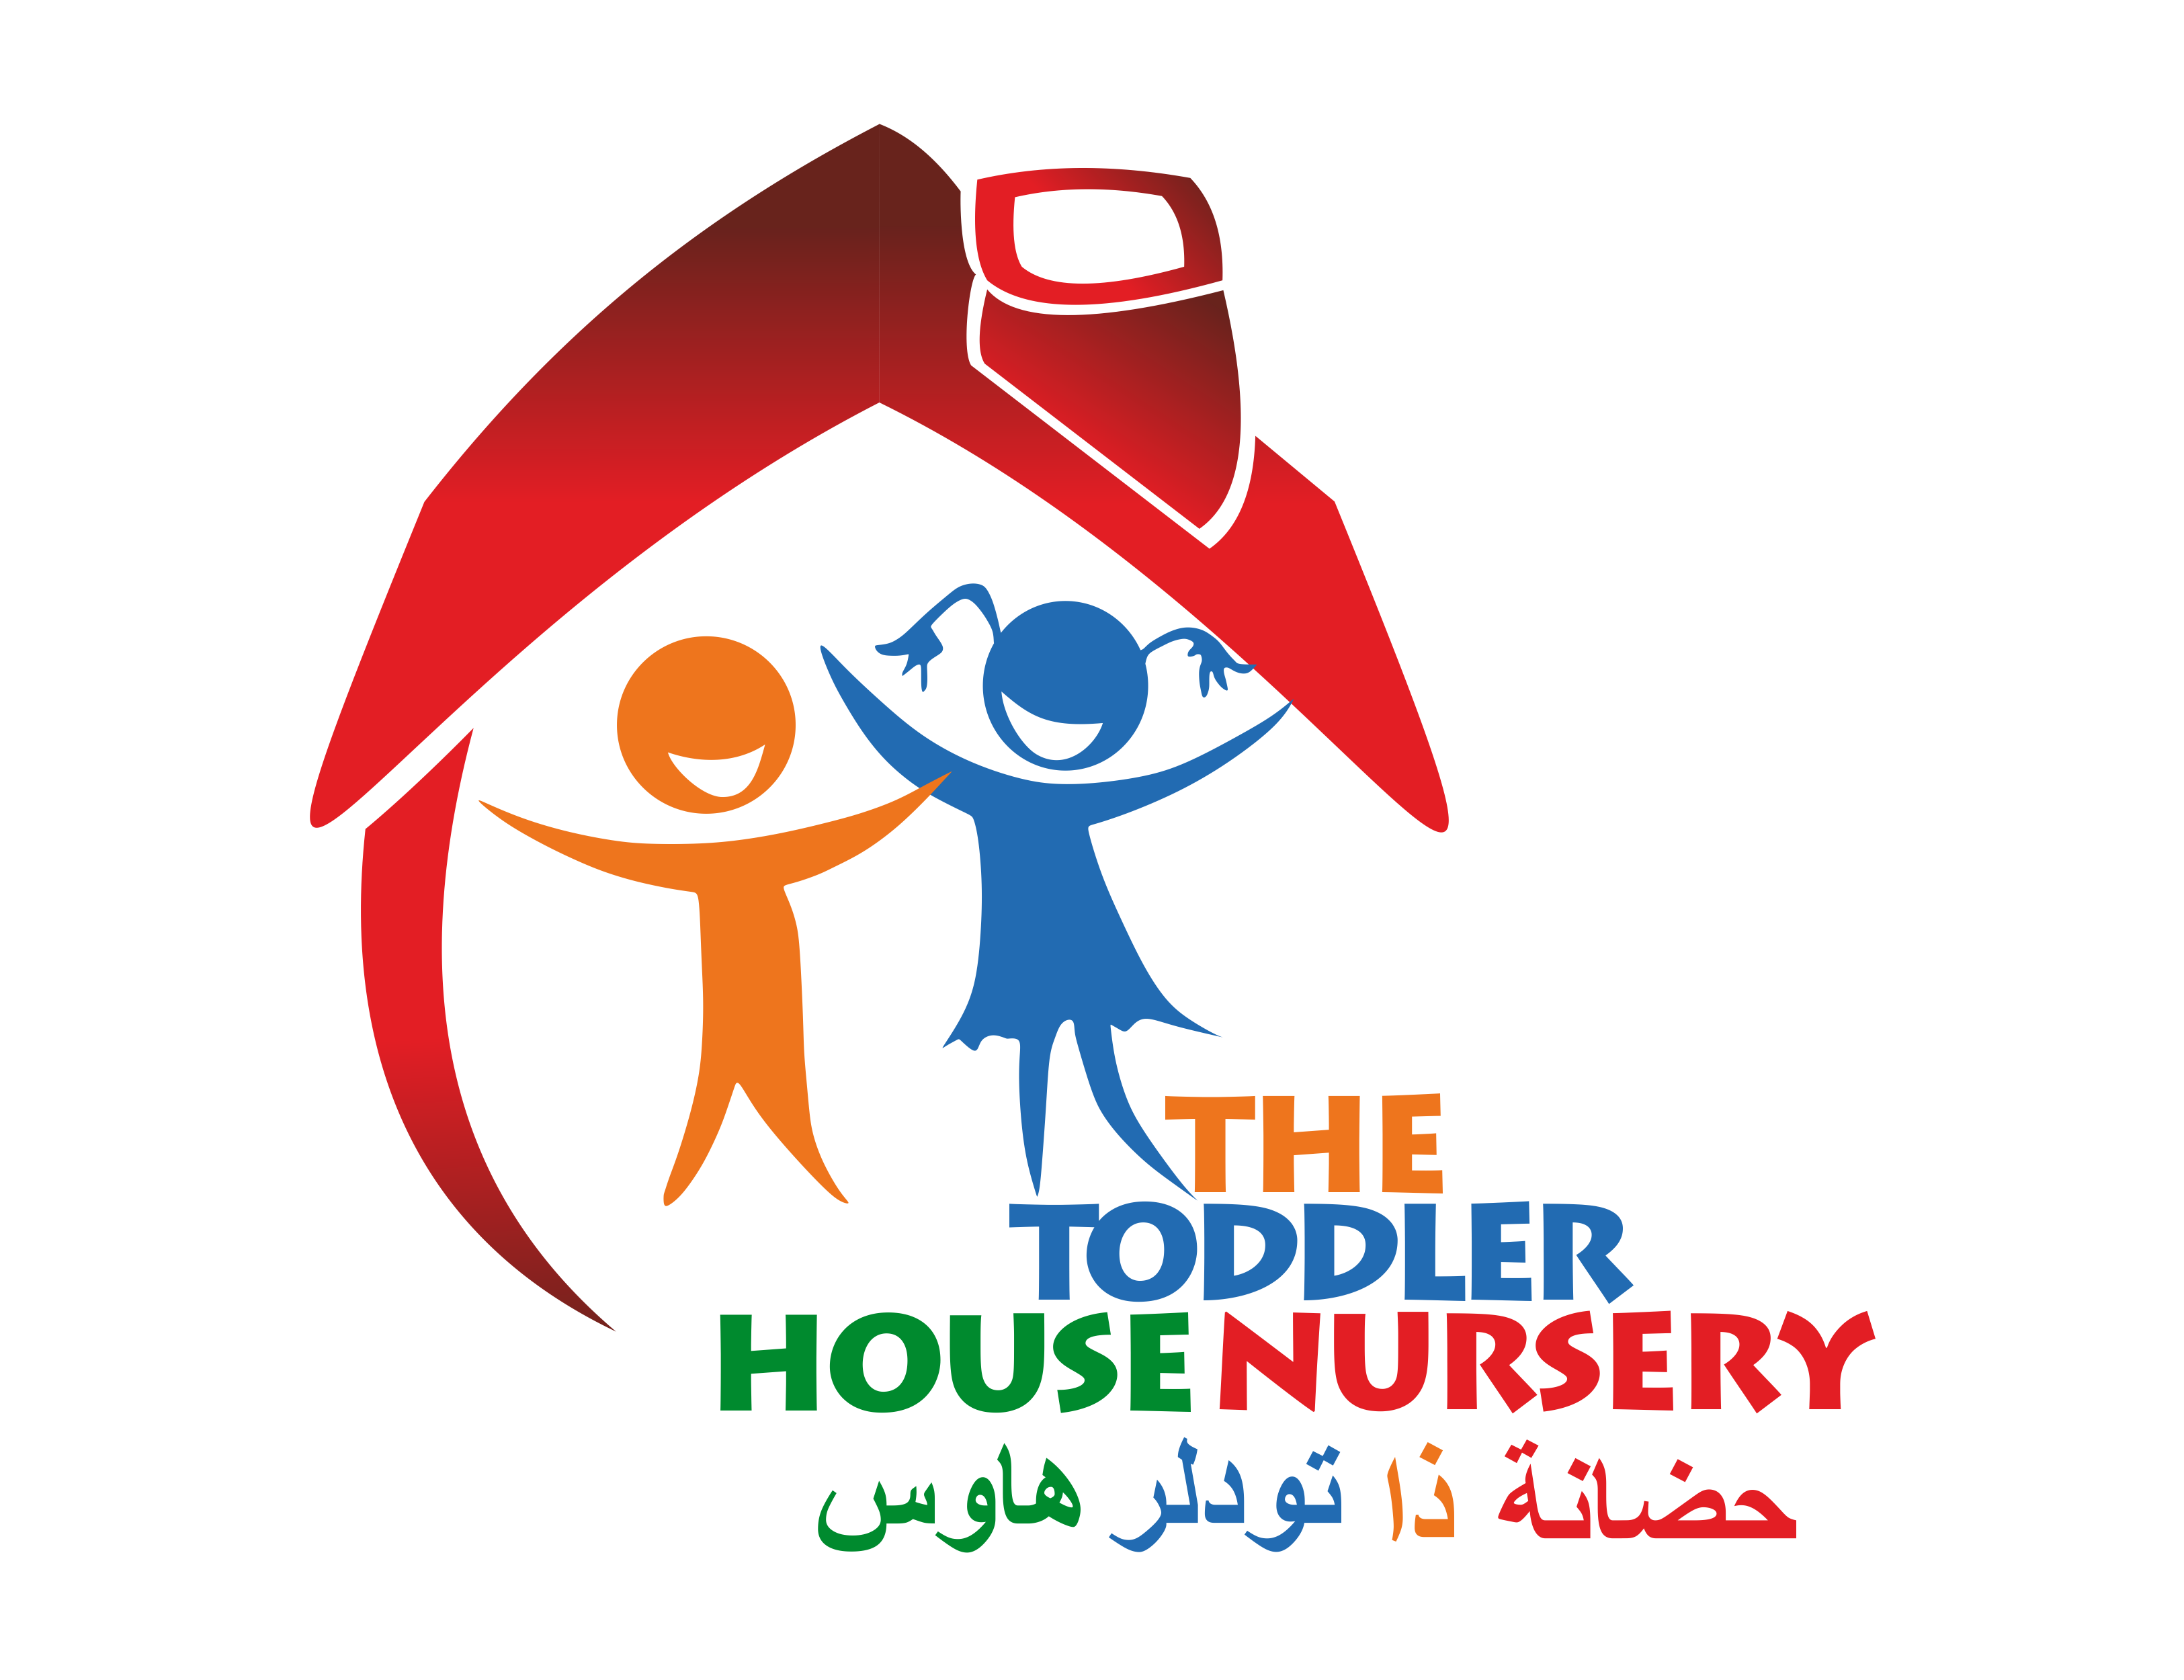 The Toddler House Nursery